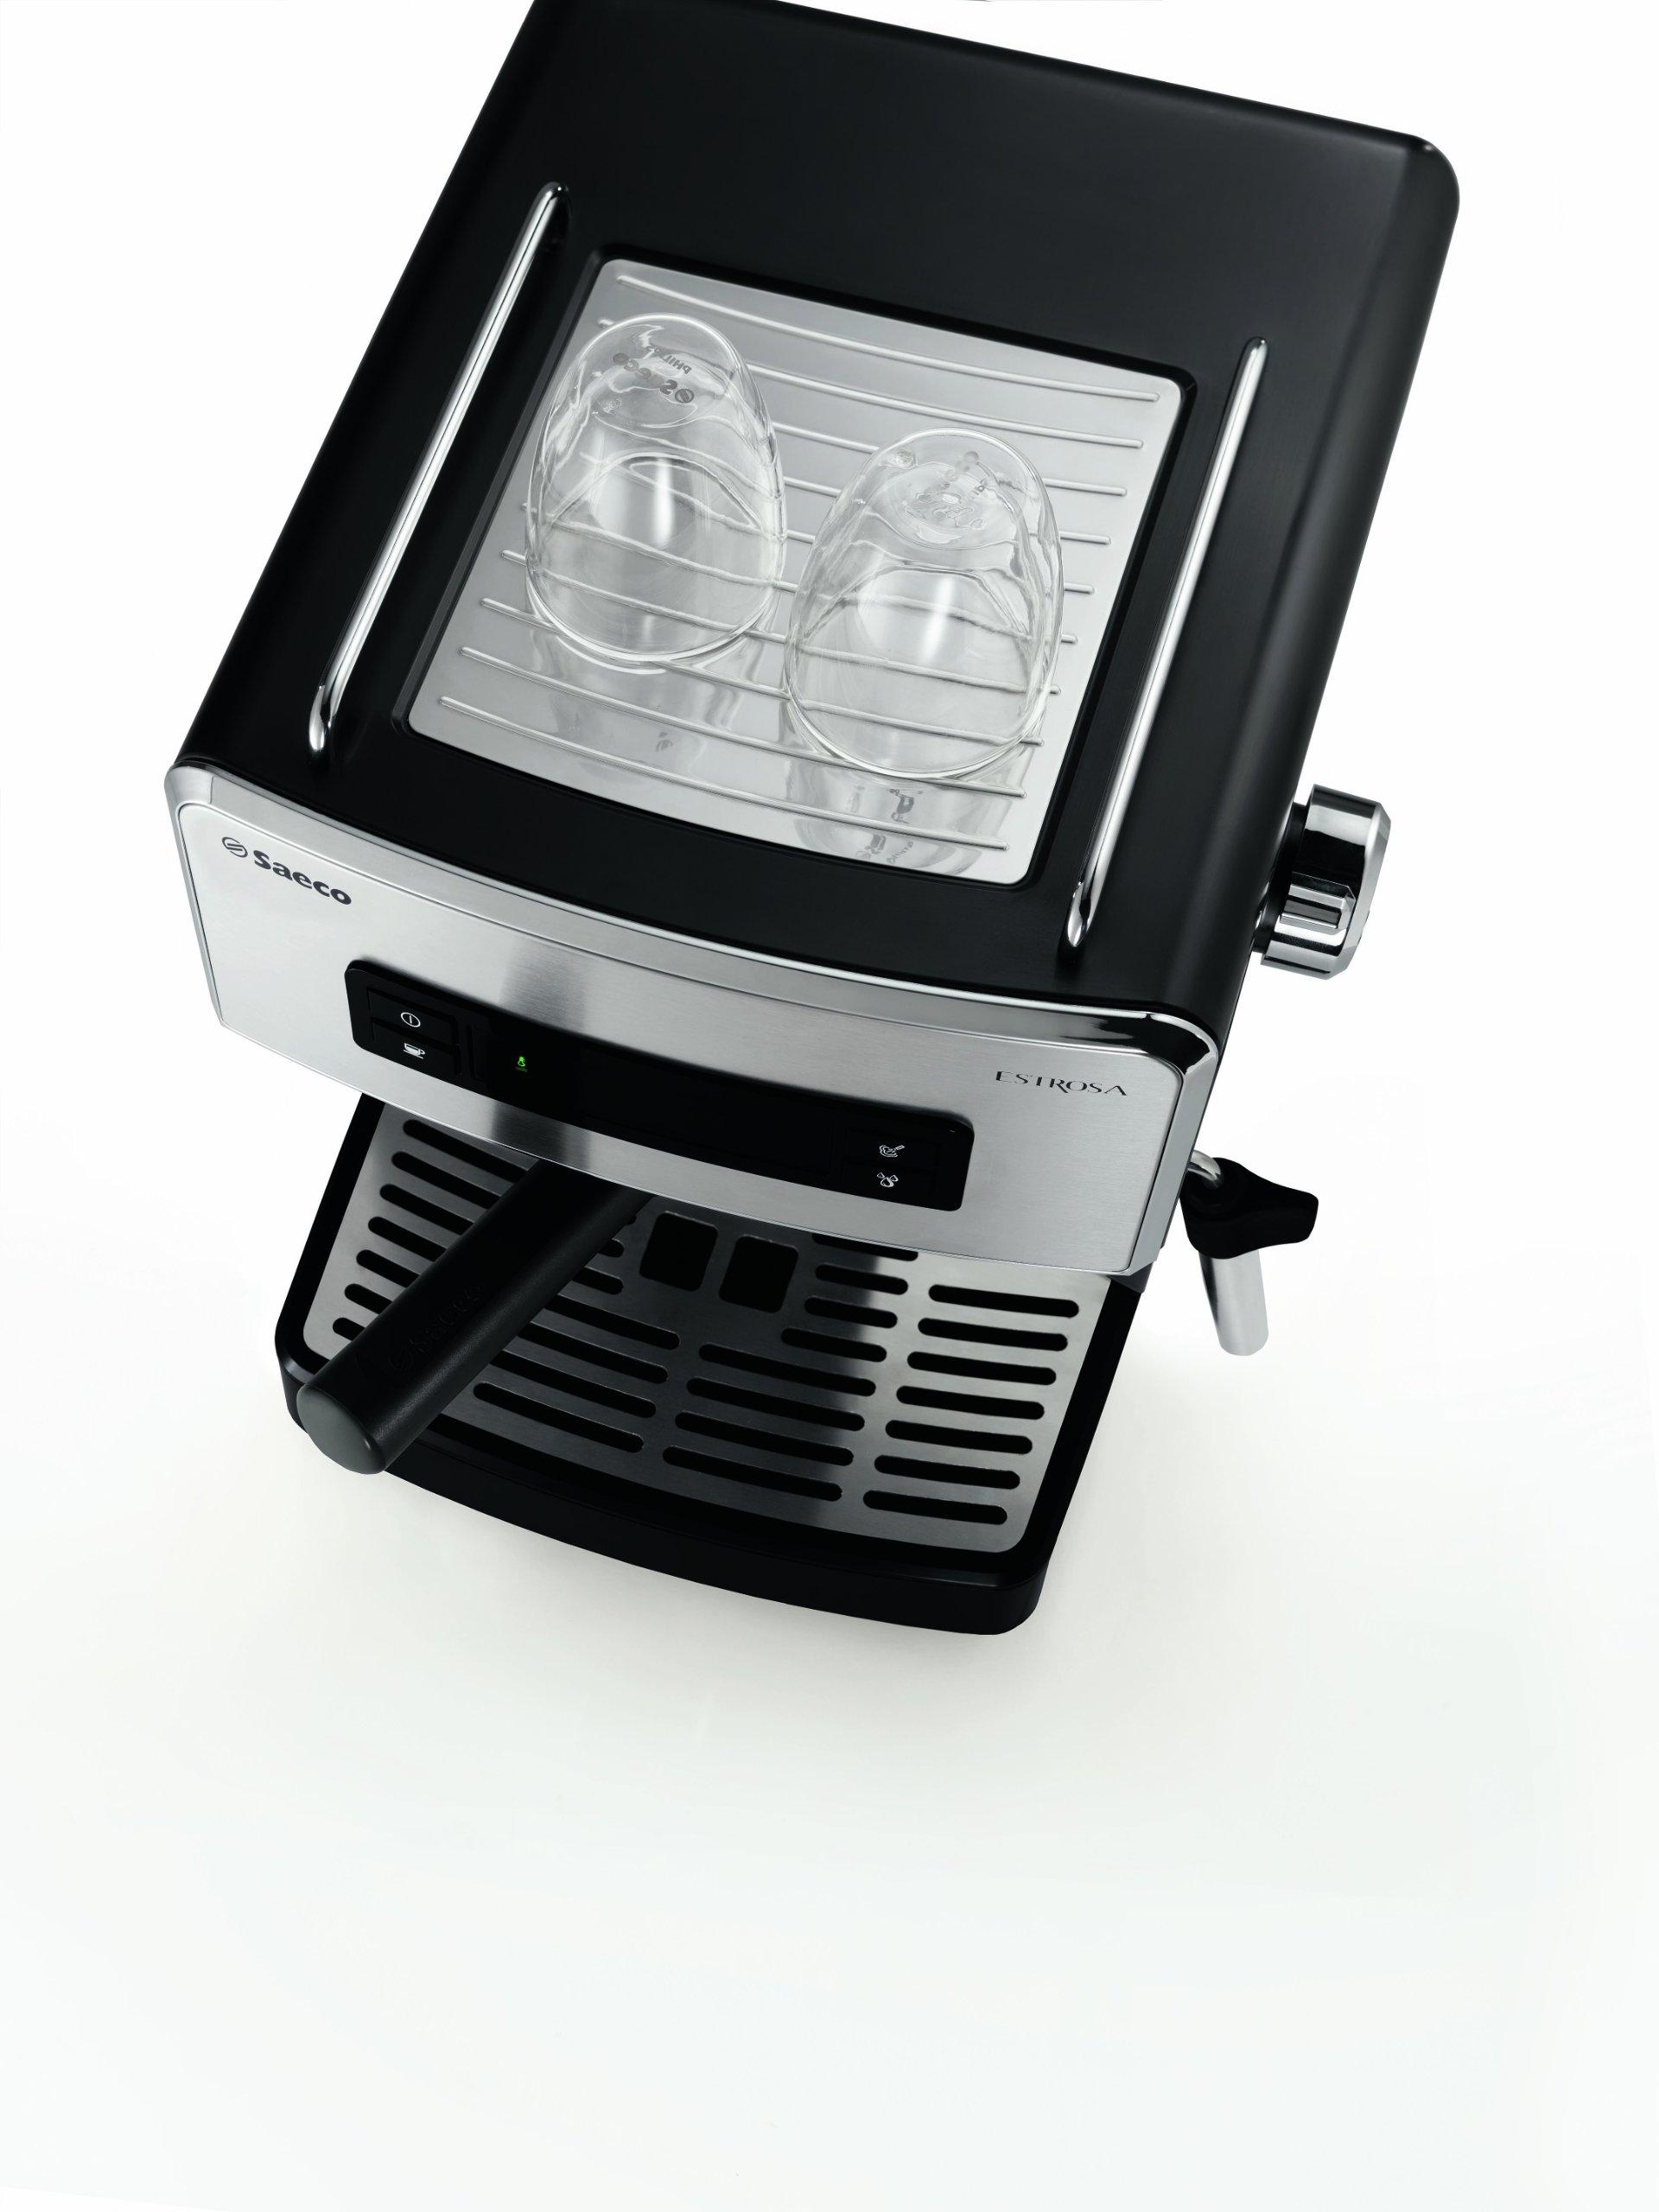 Saeco Estrosa HD8525/01 - Máquina de café espresso manual para café molido y monodosis E.S.E, color negro: Amazon.es: Hogar